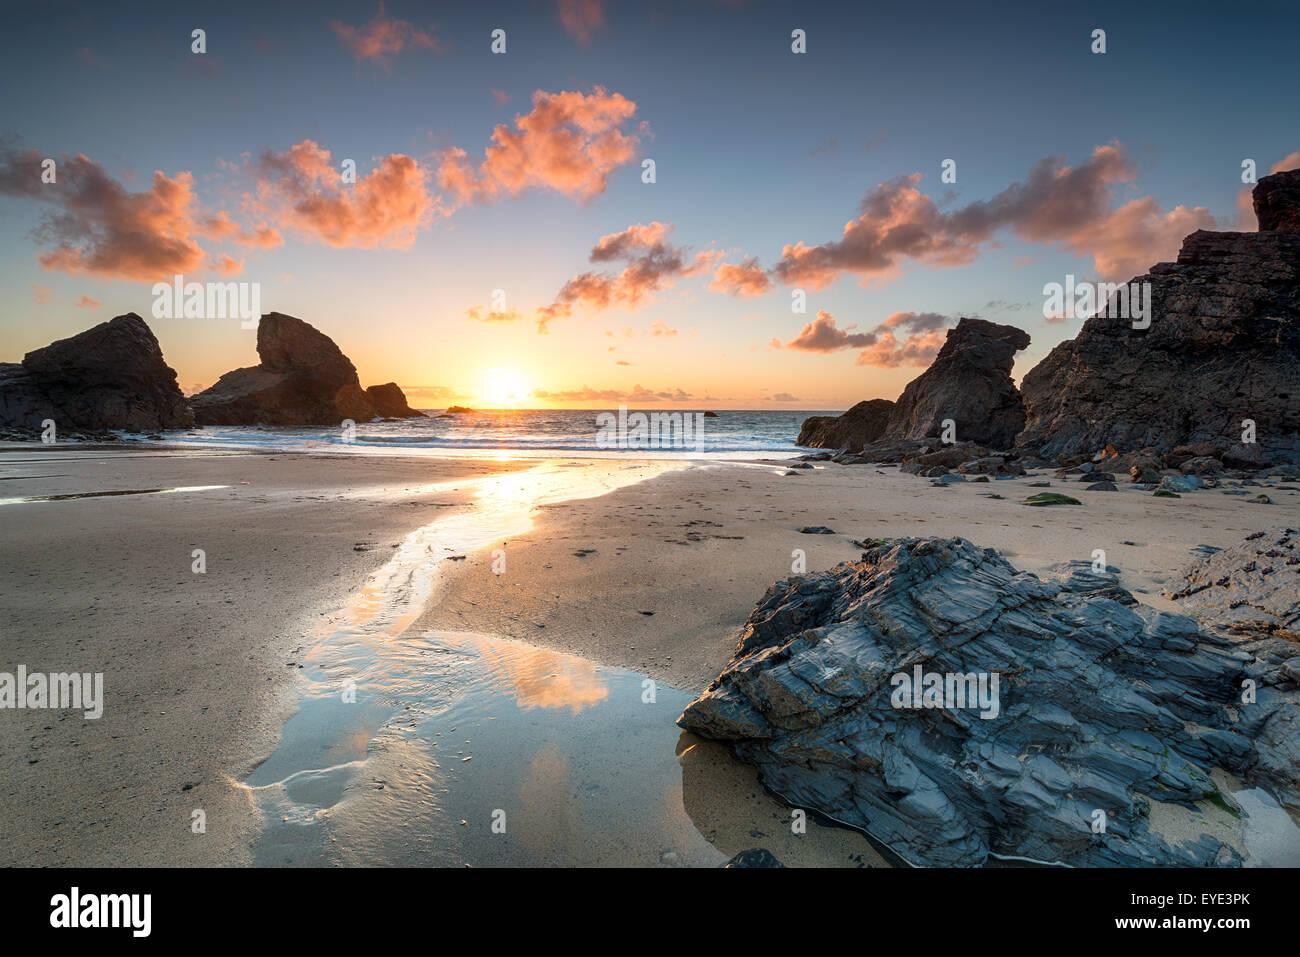 Sunset at Porthcothan bay on the north Cornwall coast - Stock Image